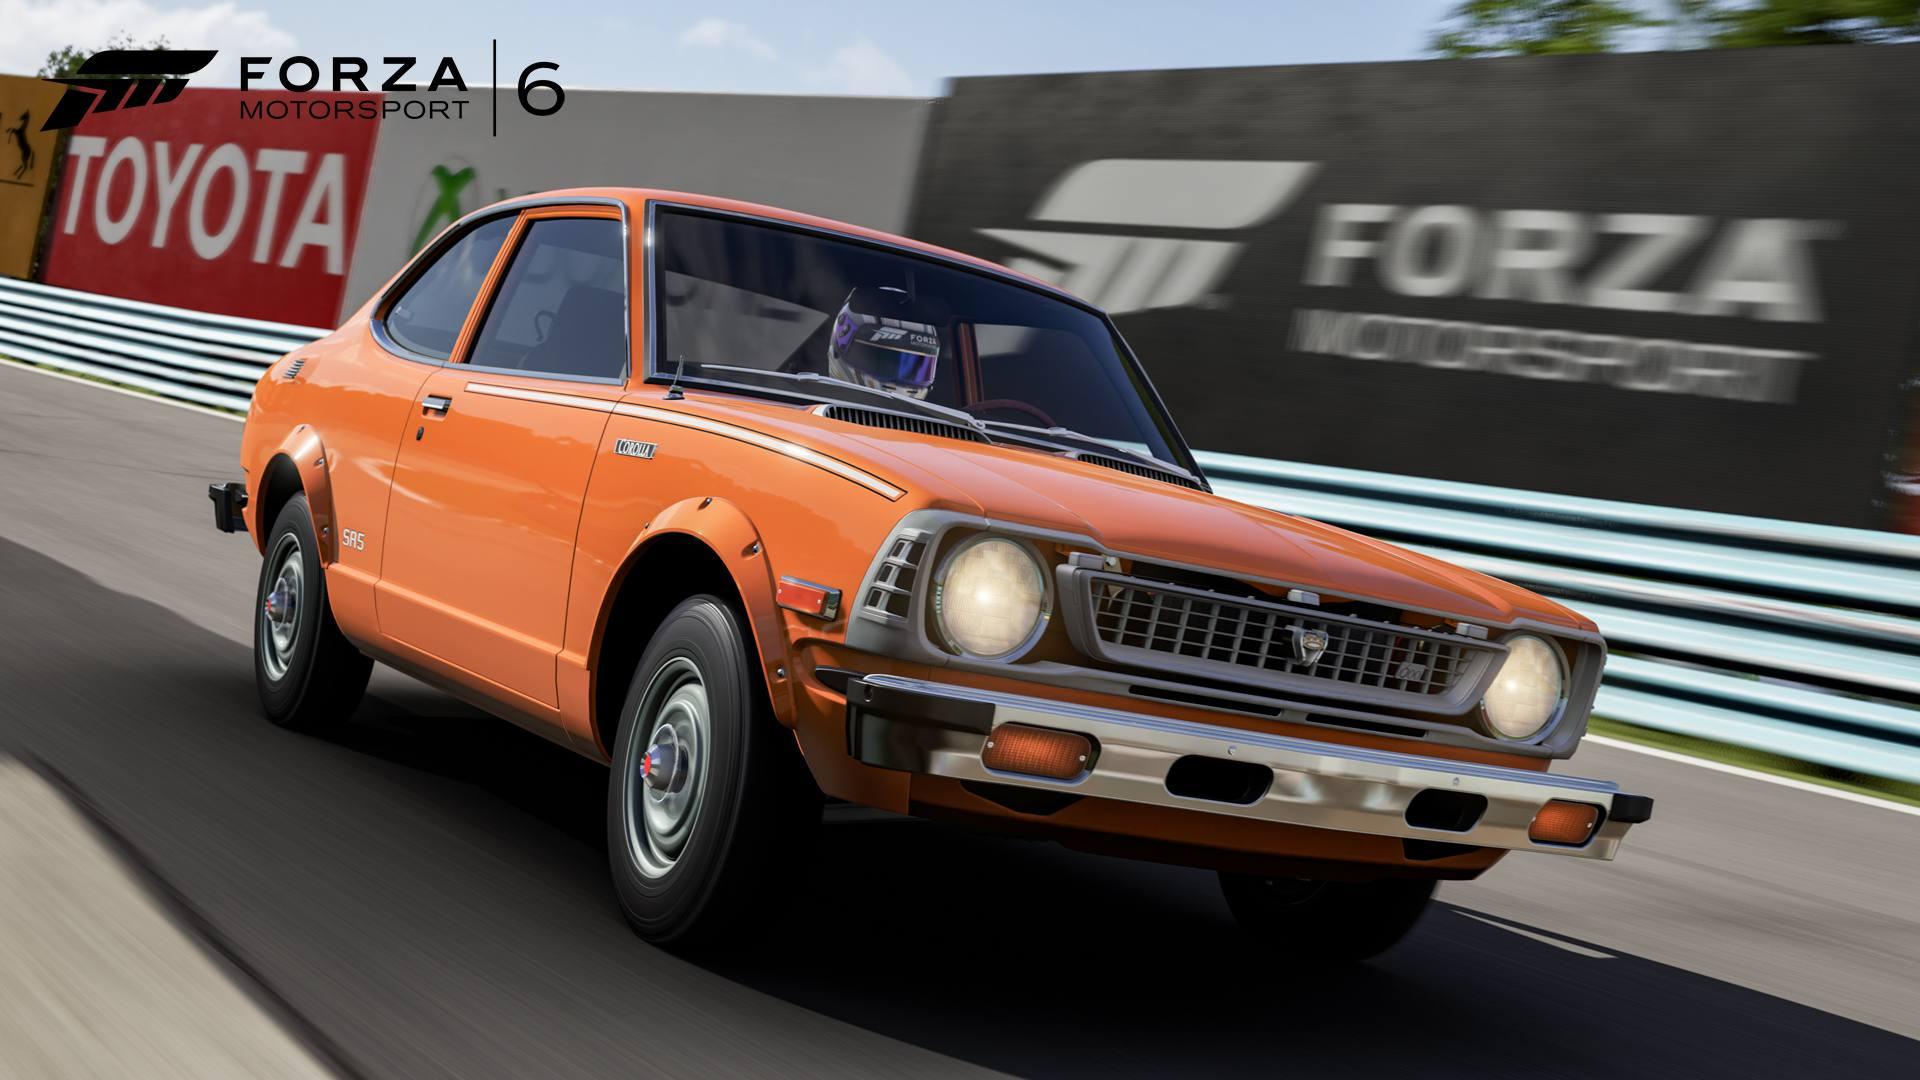 Forza Motorsport 6 27-01-16 1974 Toyota Corolla SR5